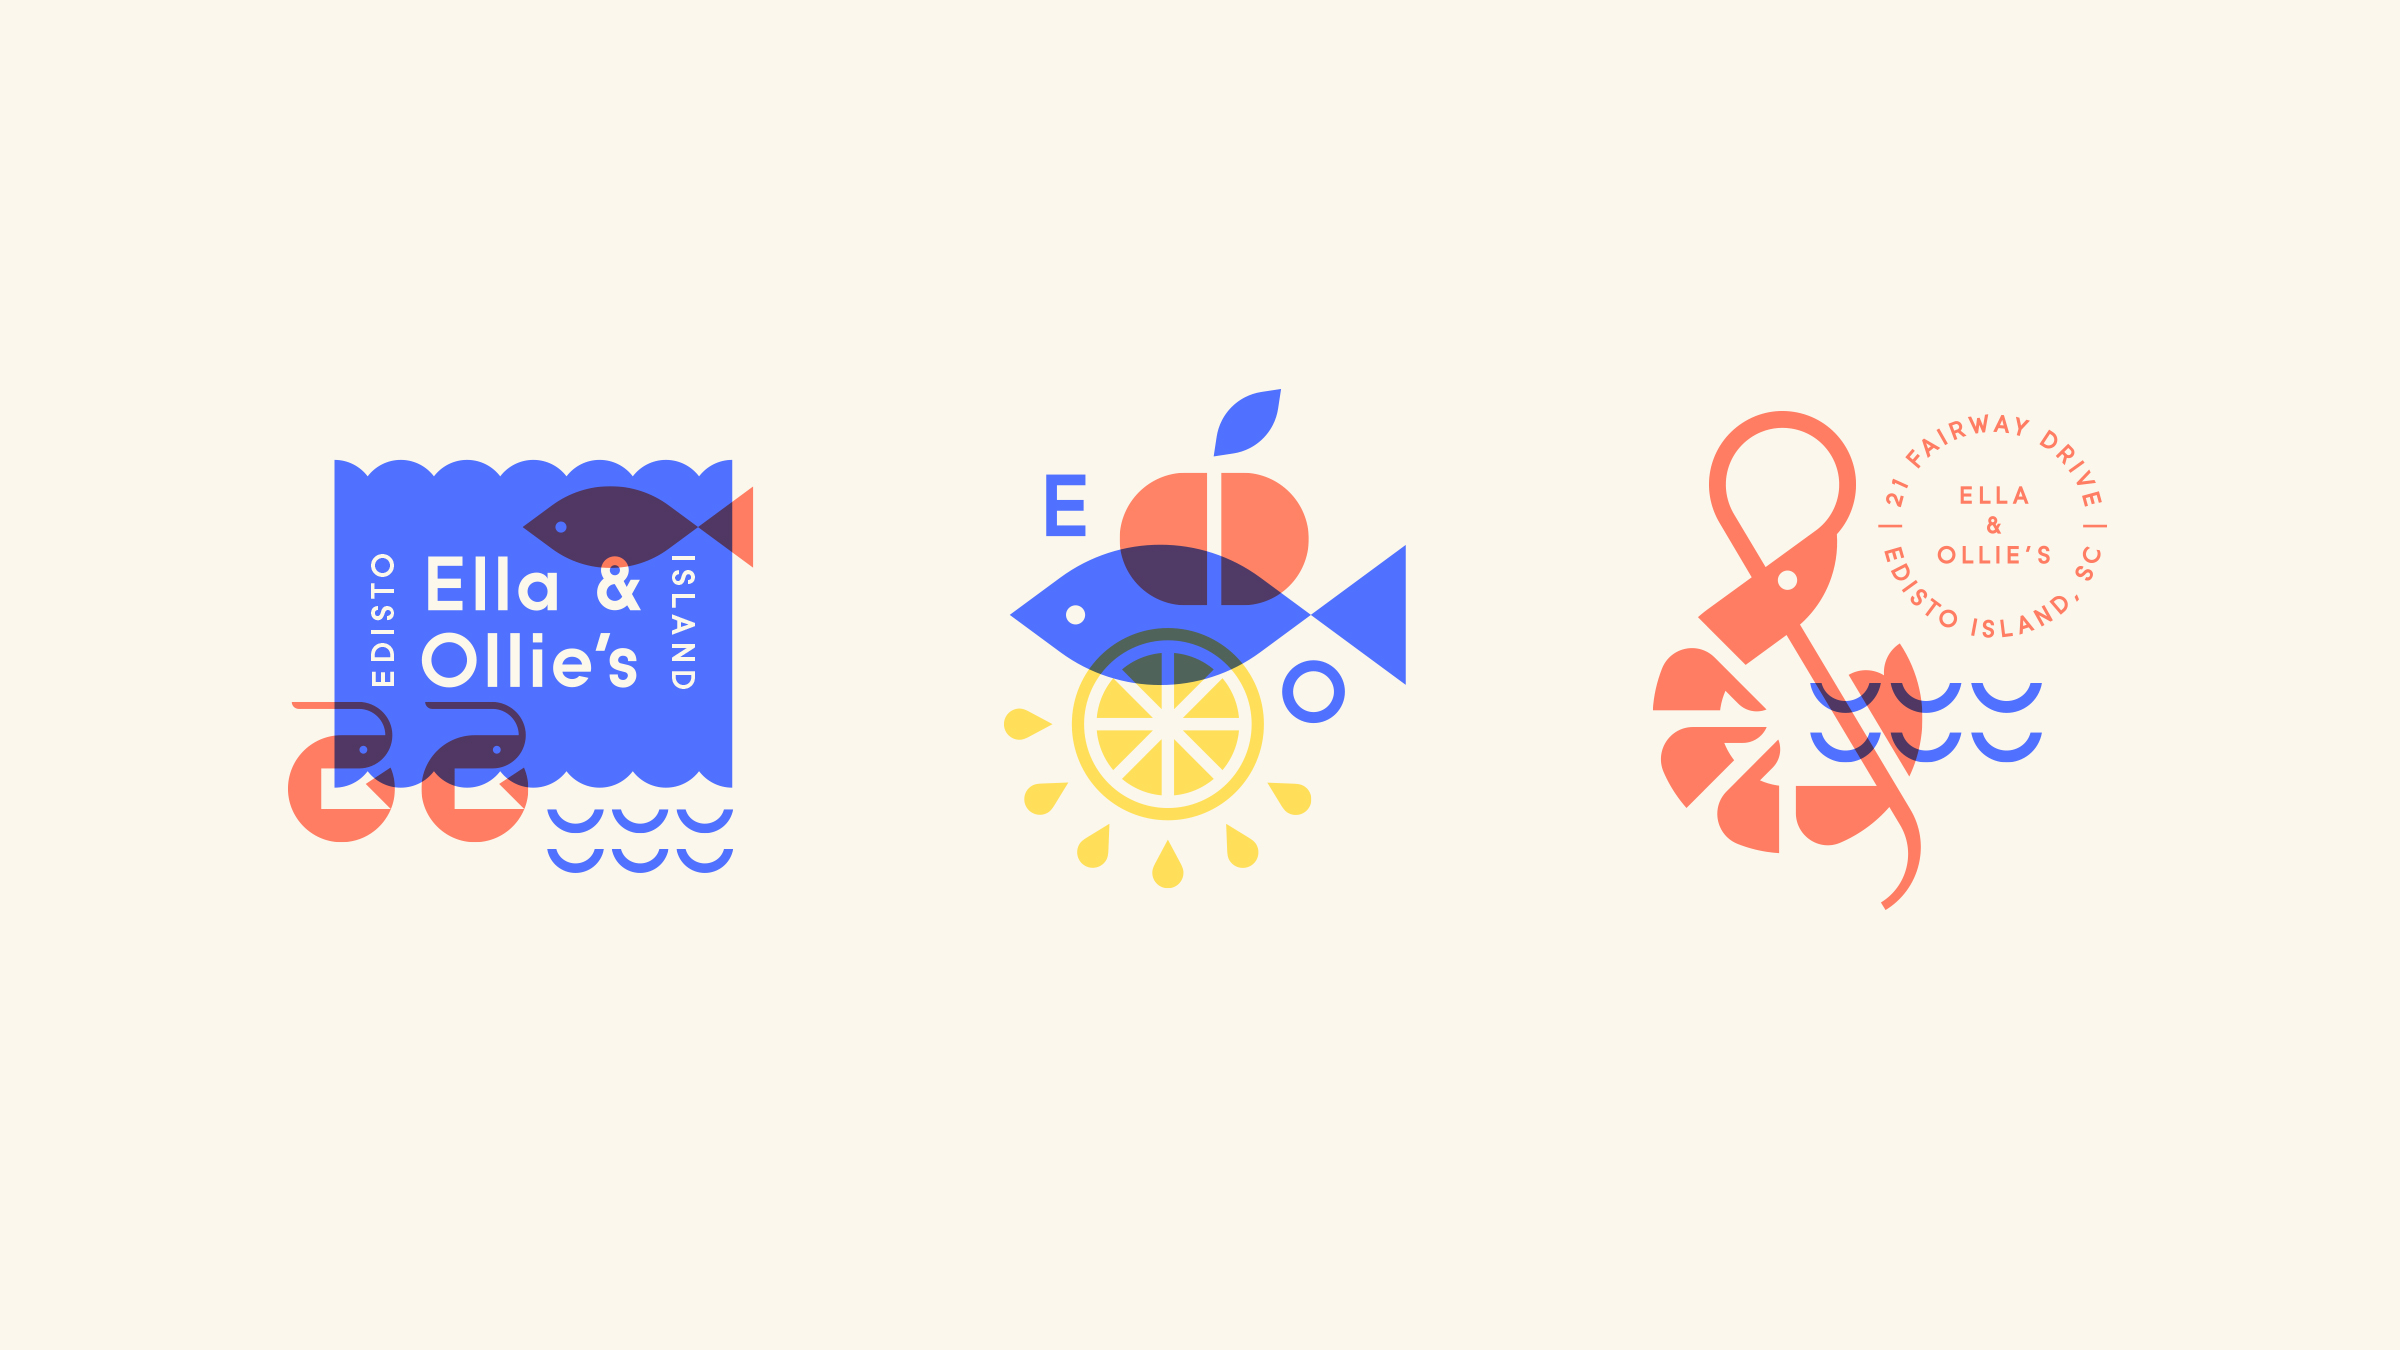 Ella & Ollie's Seafood Restaurant Logo Illustrations